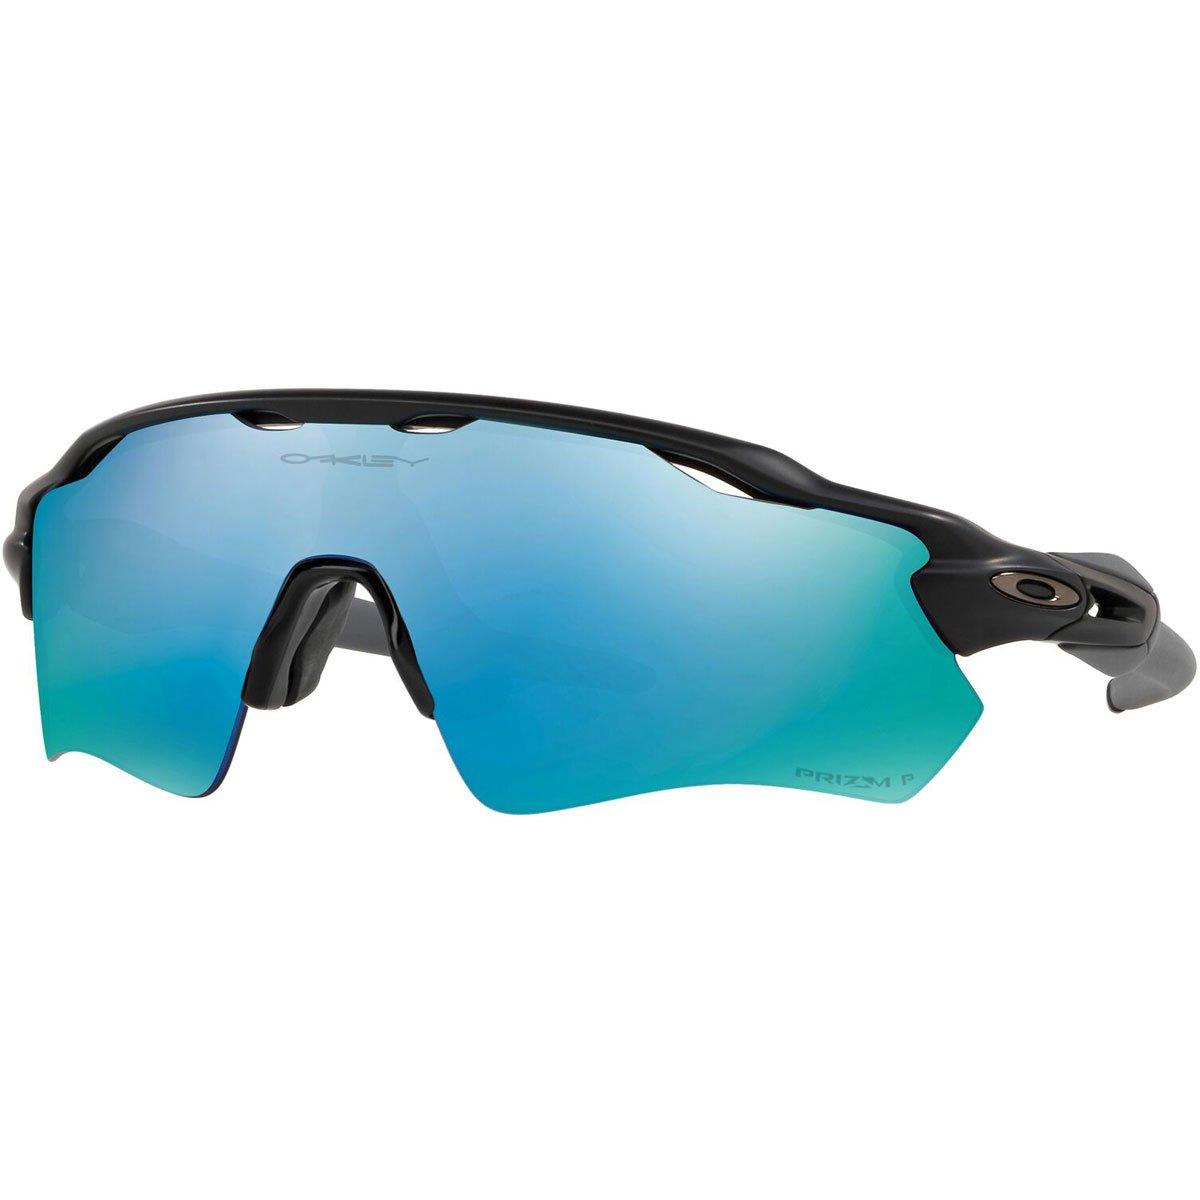 Oakley Unisex Radar EV Path Polarized Sunglasses,Black